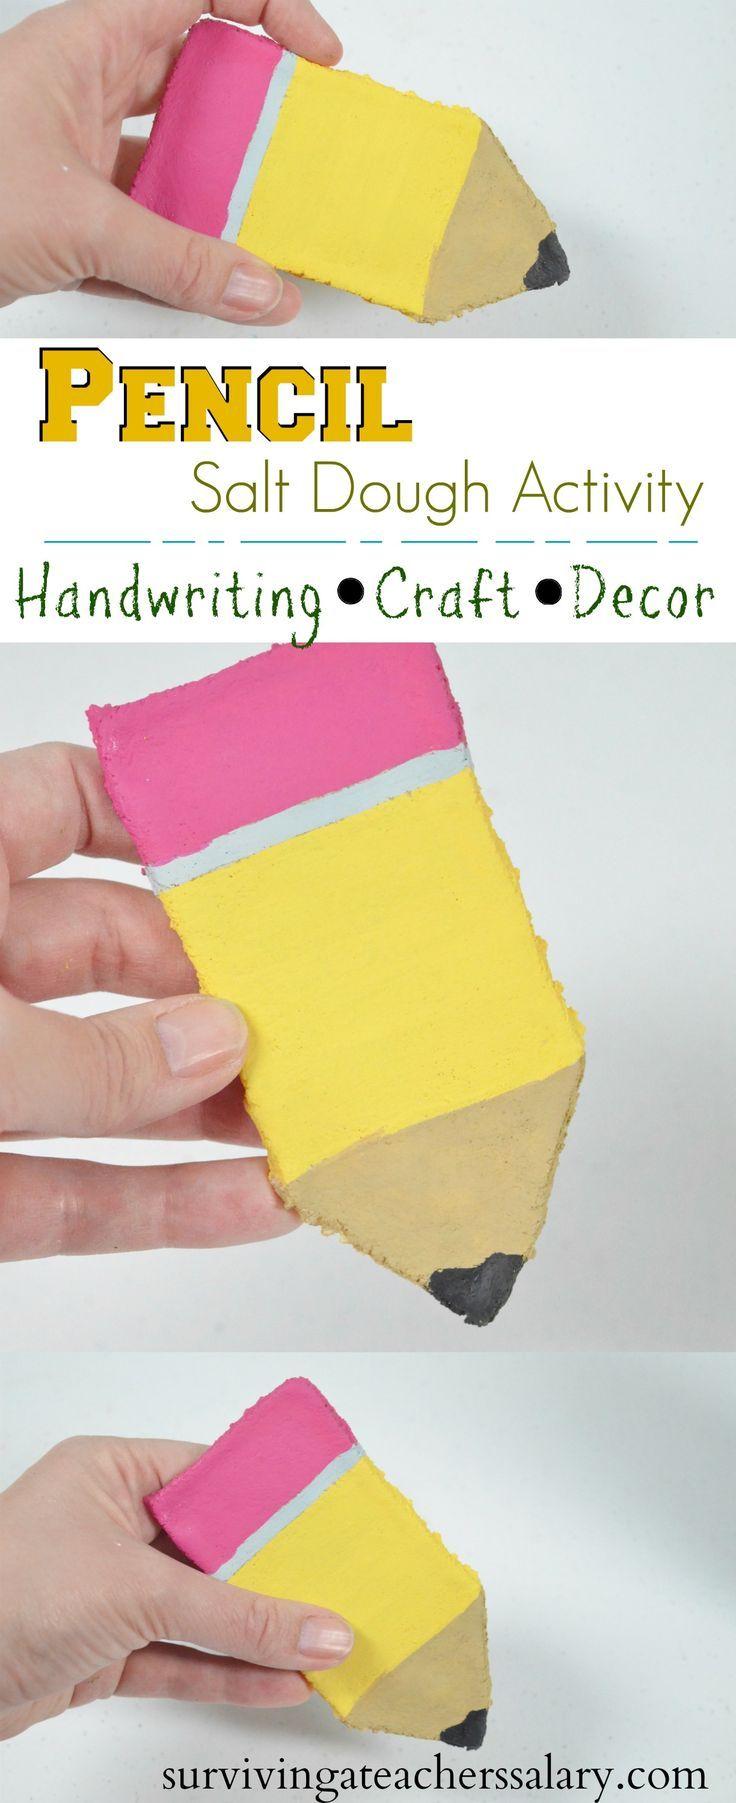 Lets Write Our Name Pencil Salt Dough Activity for Kindergarten Back to School craft Salt Dough R